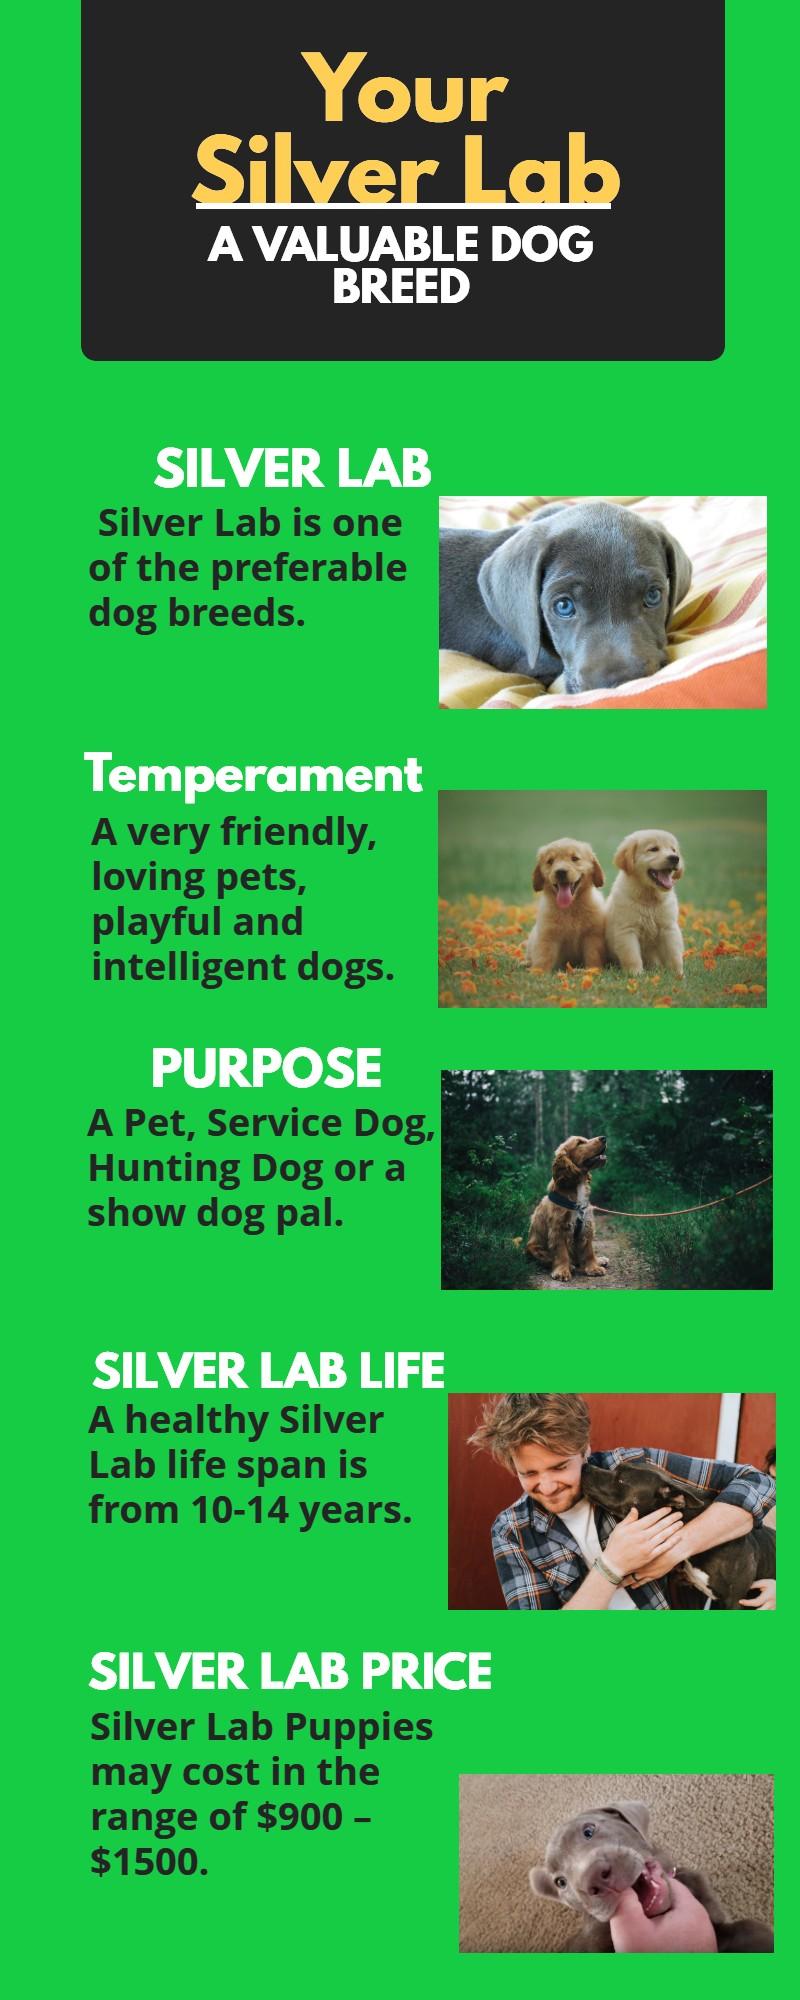 Highlights of the Labrador Dog Breed